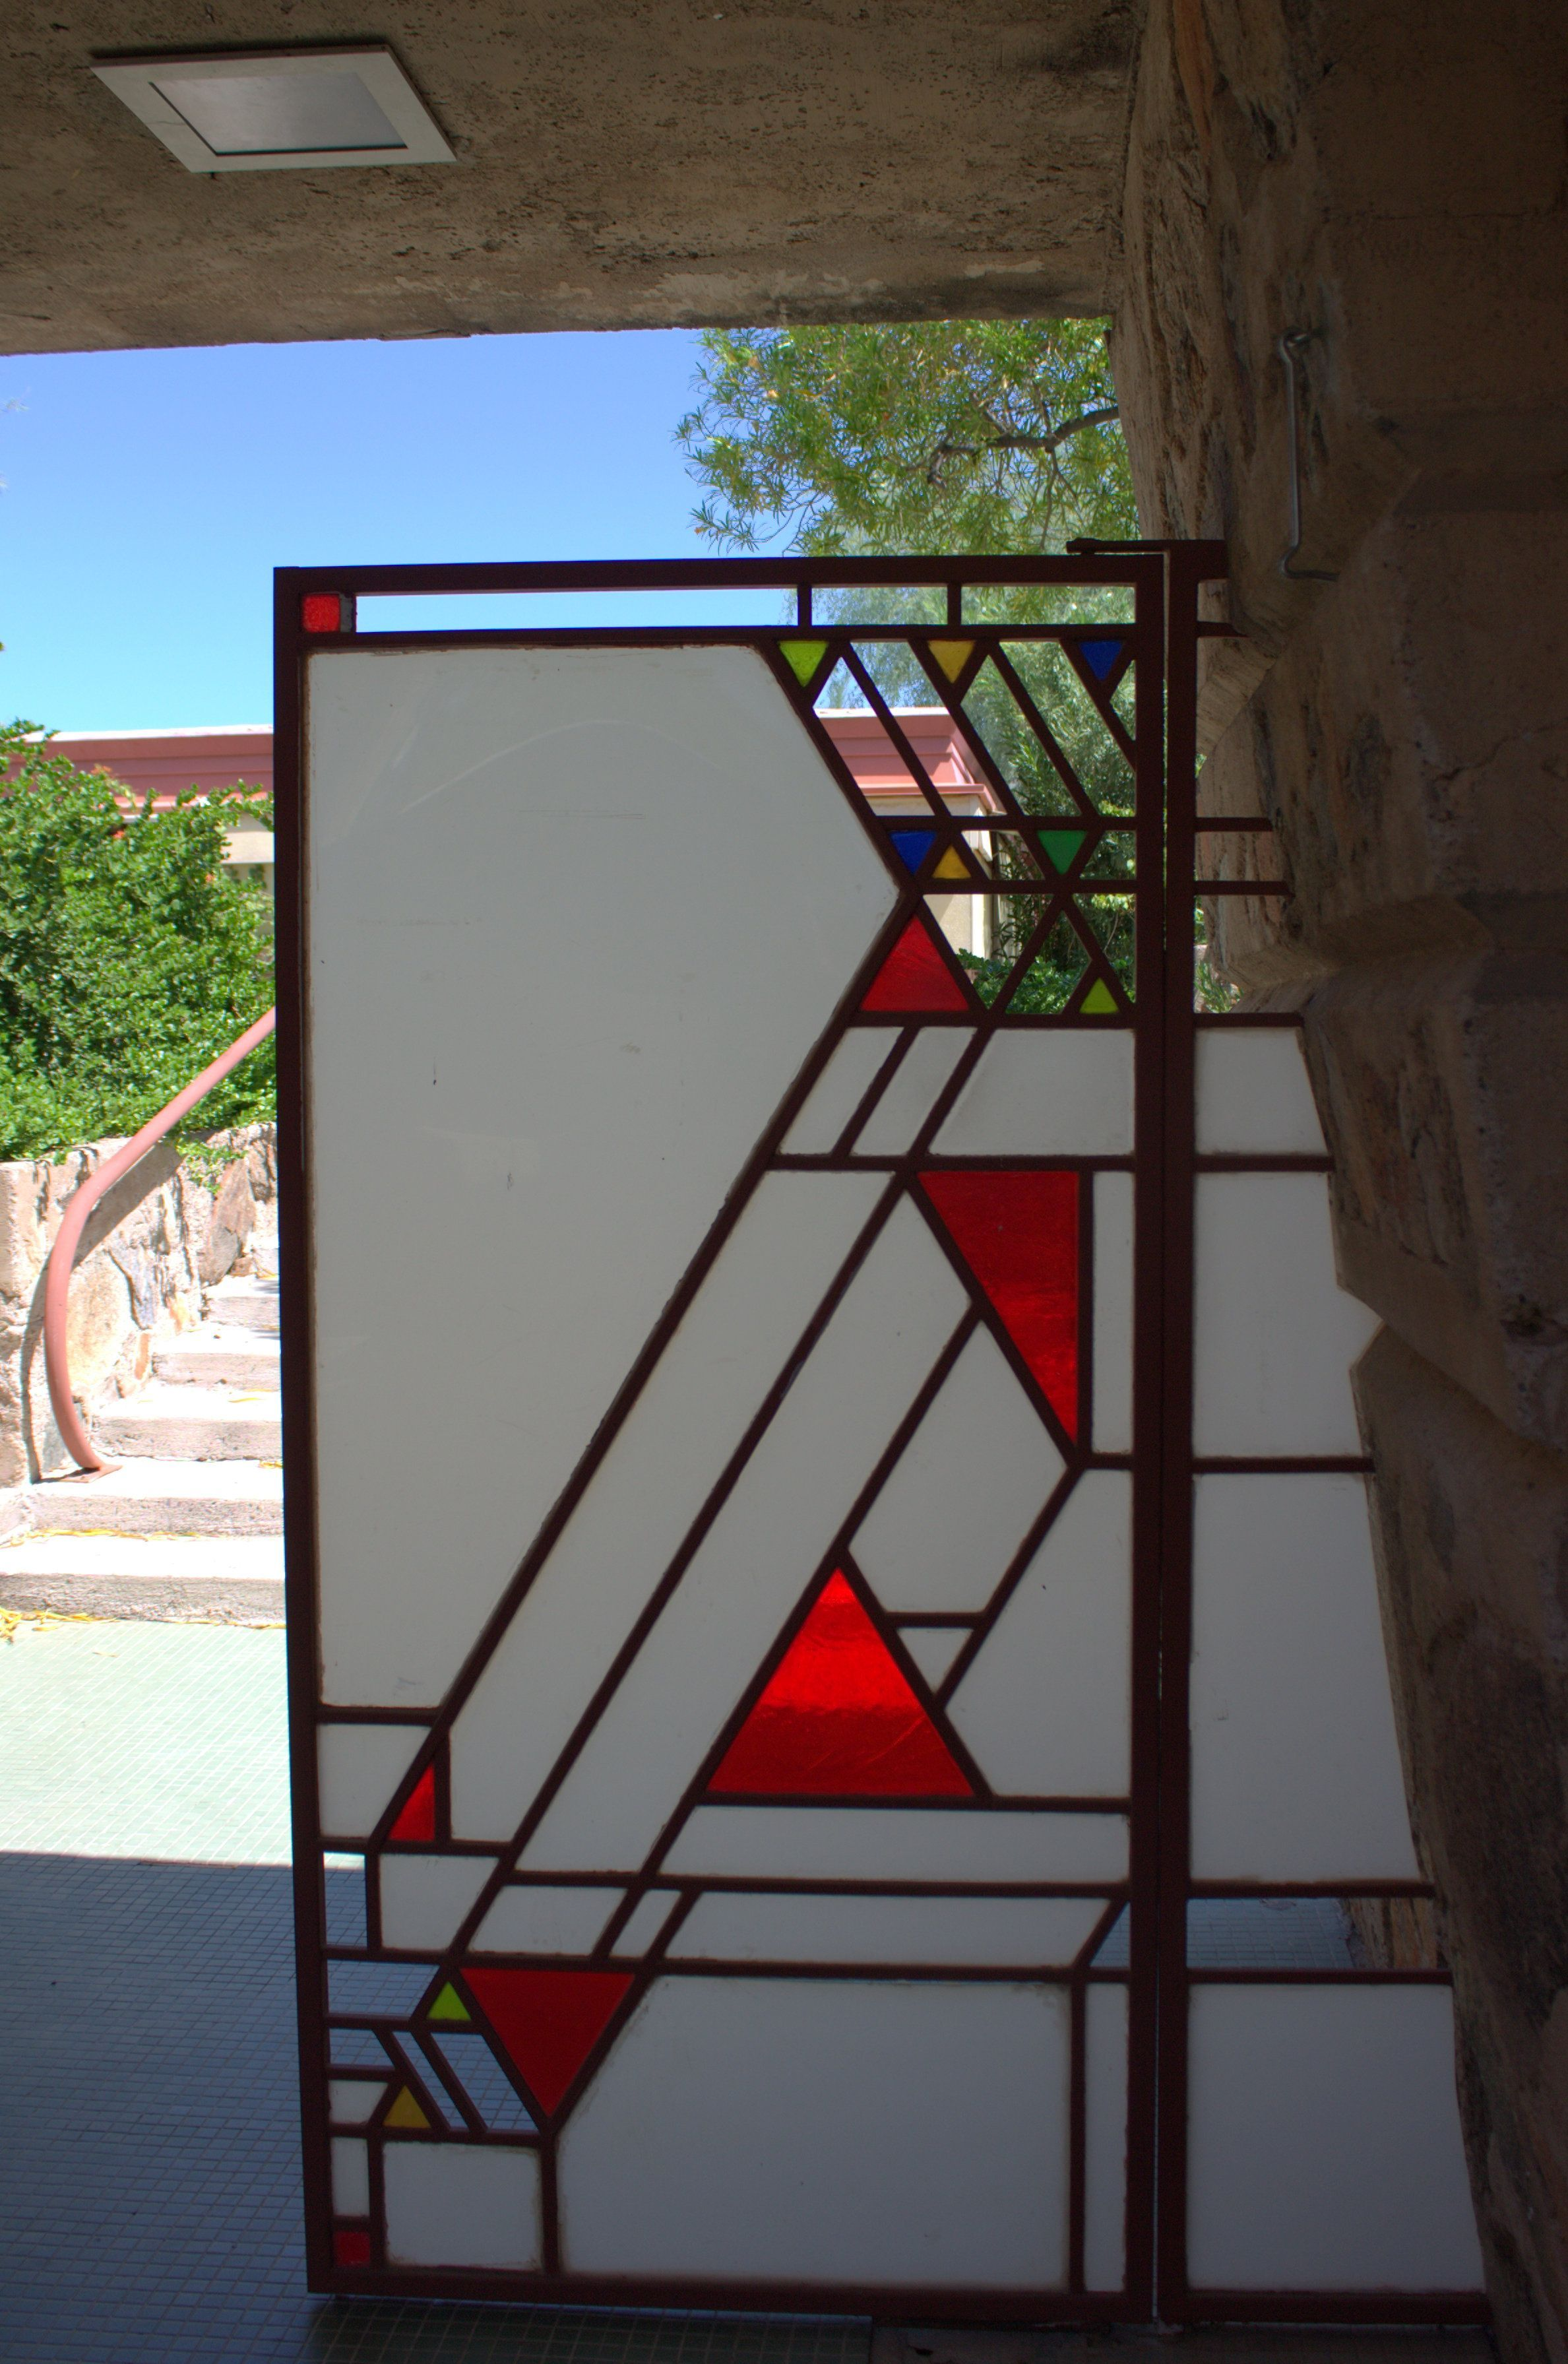 Art glass in gate taliesin west scottsdale arizona